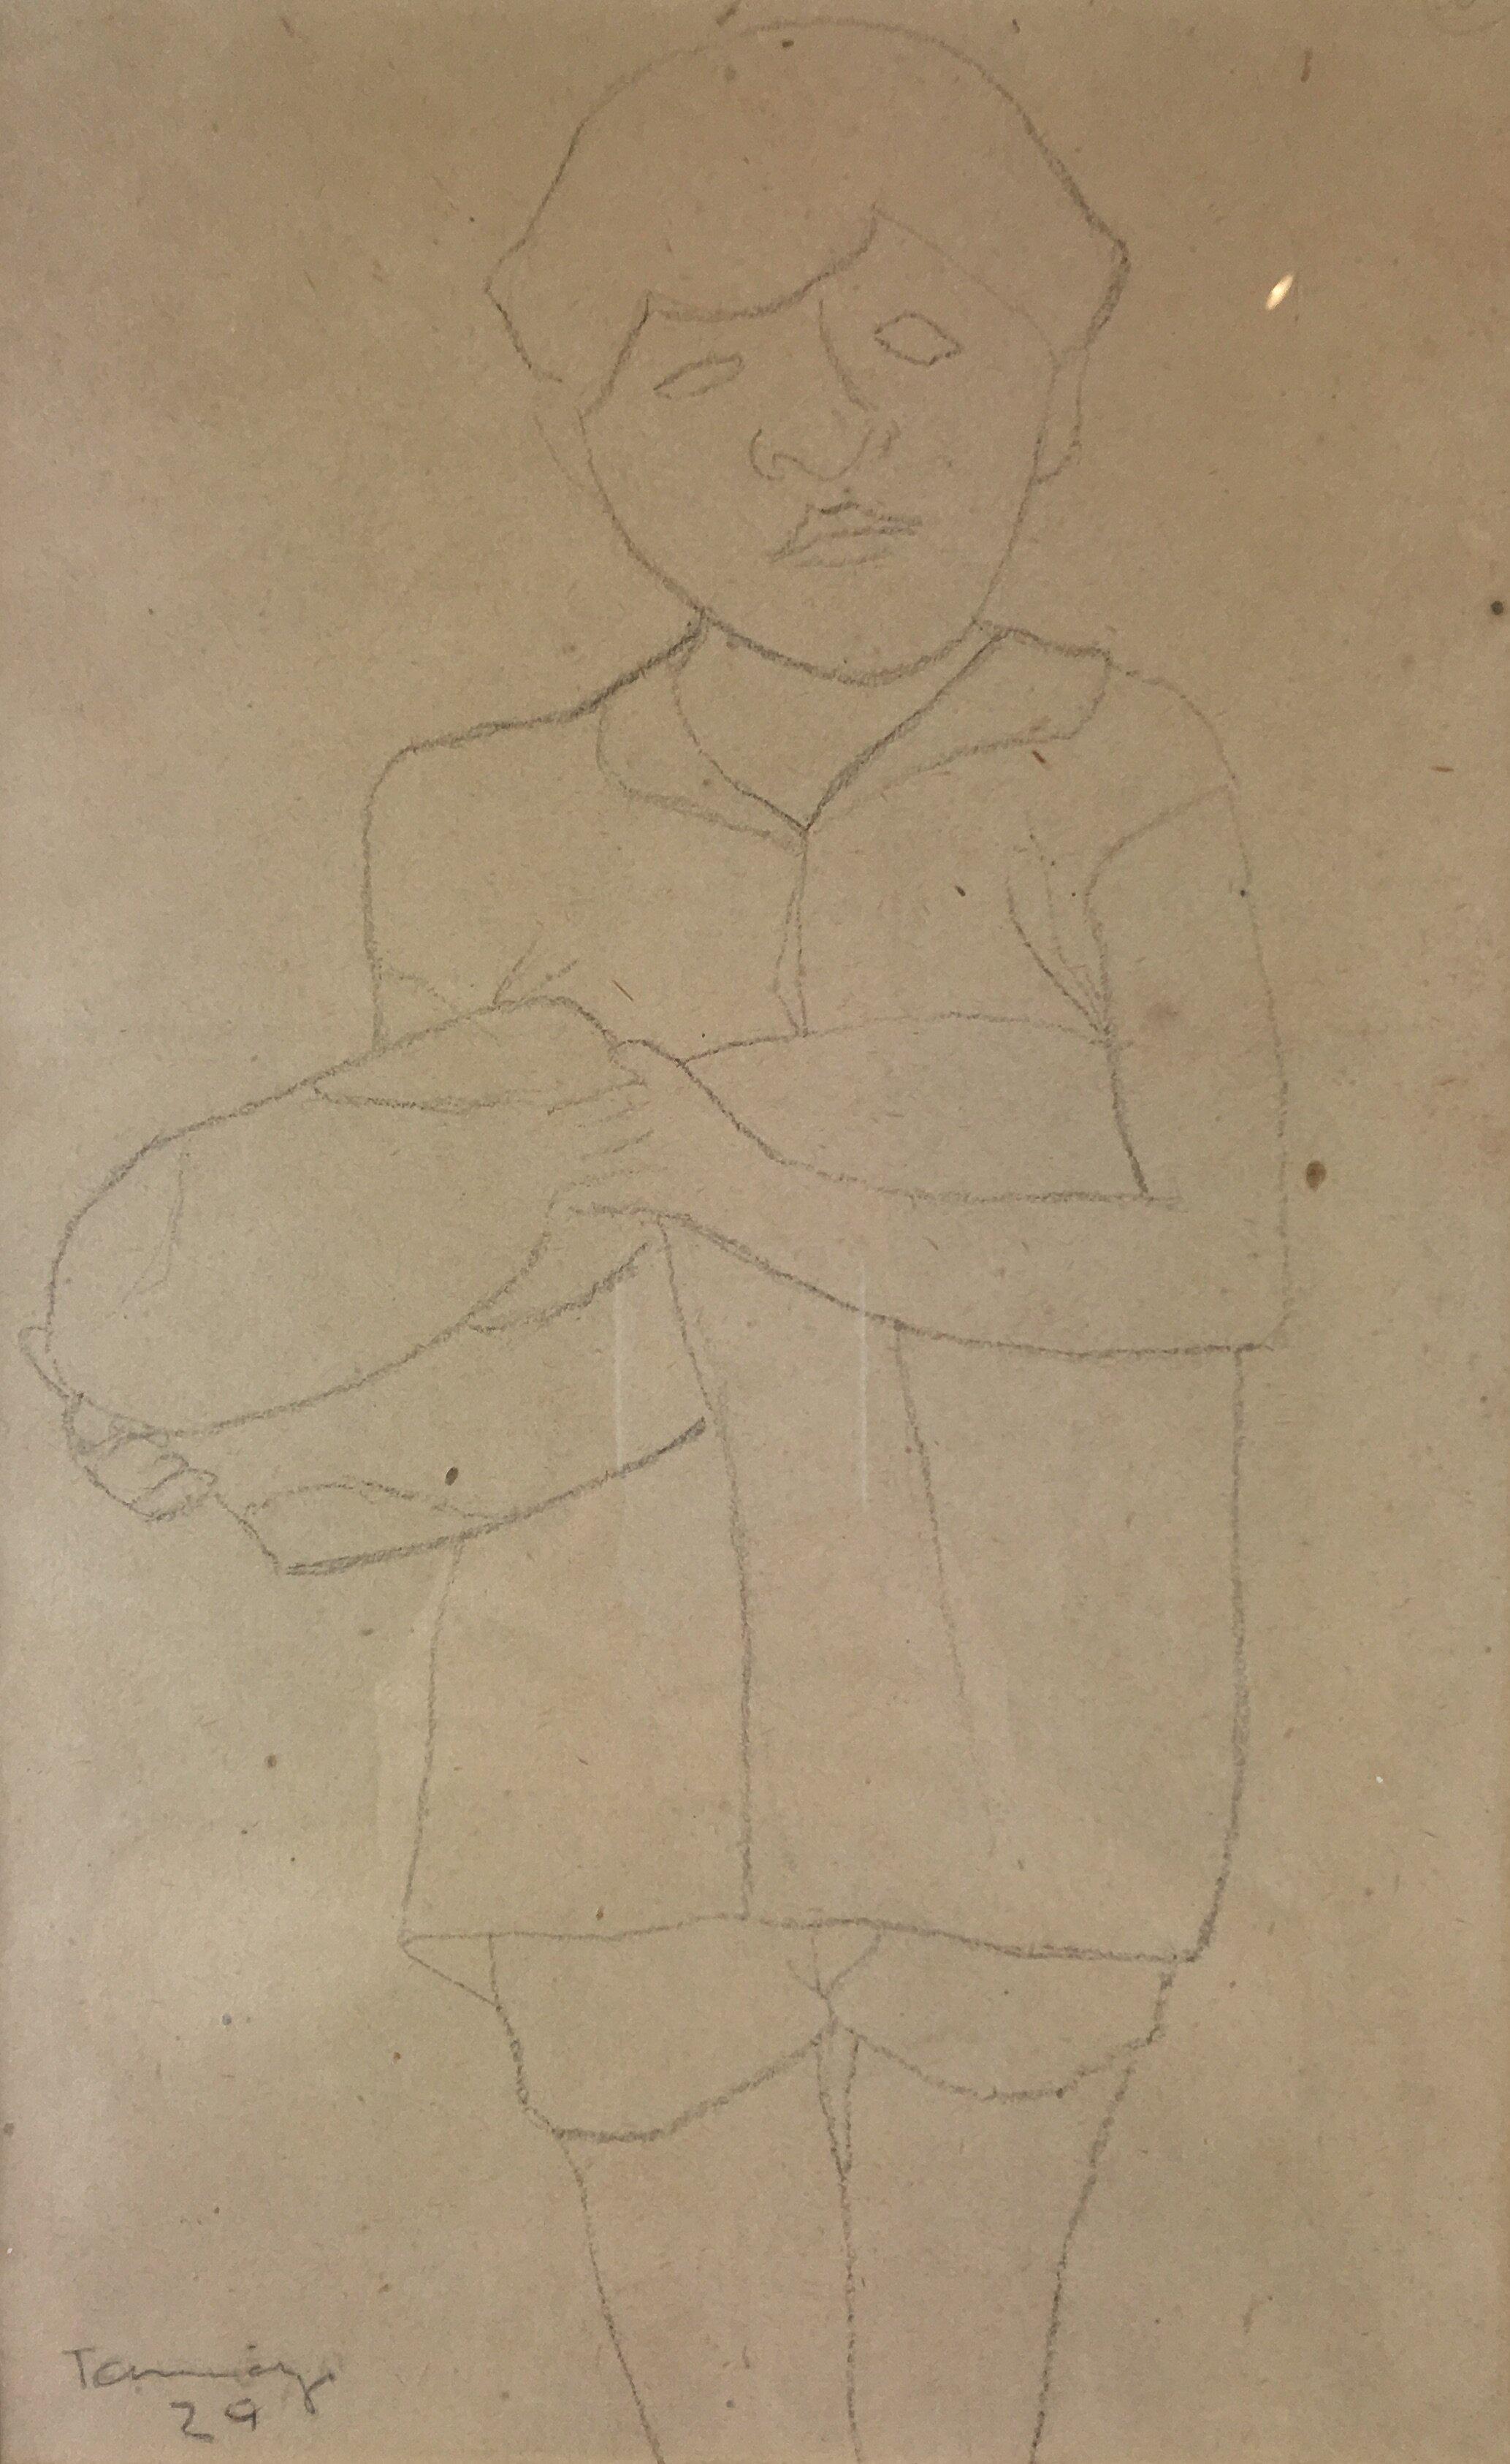 Rufino Tamayo drawing